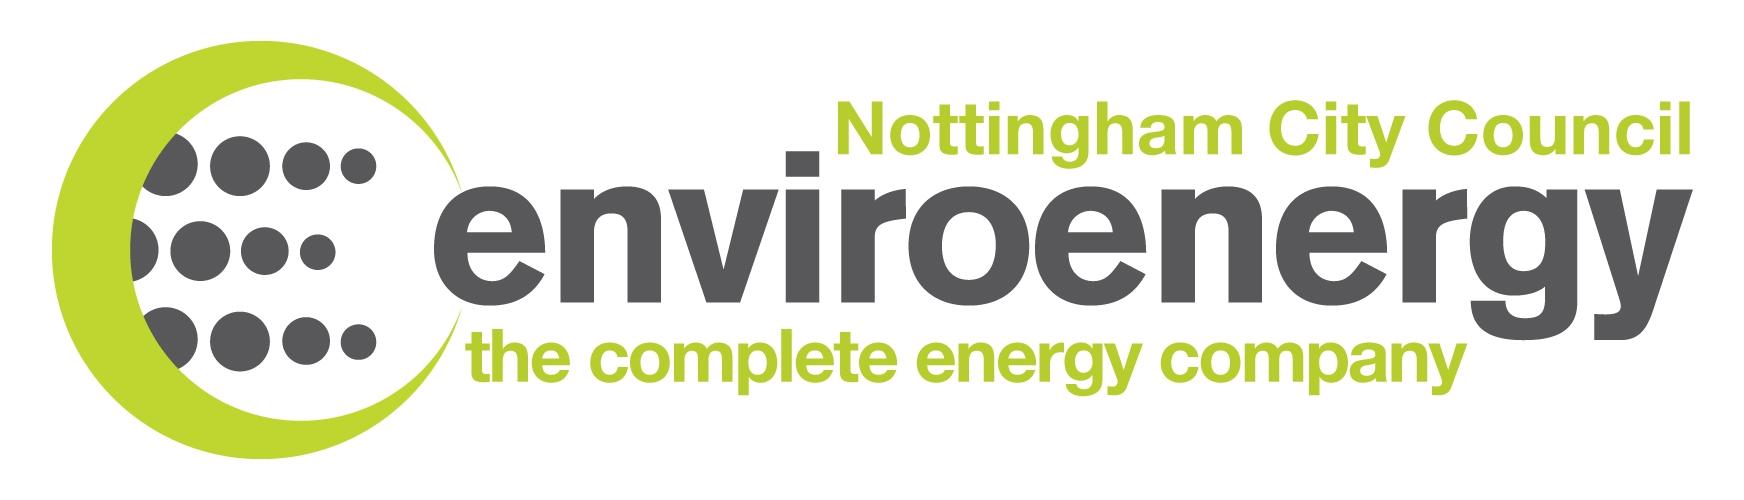 EnviroEnergy Limited